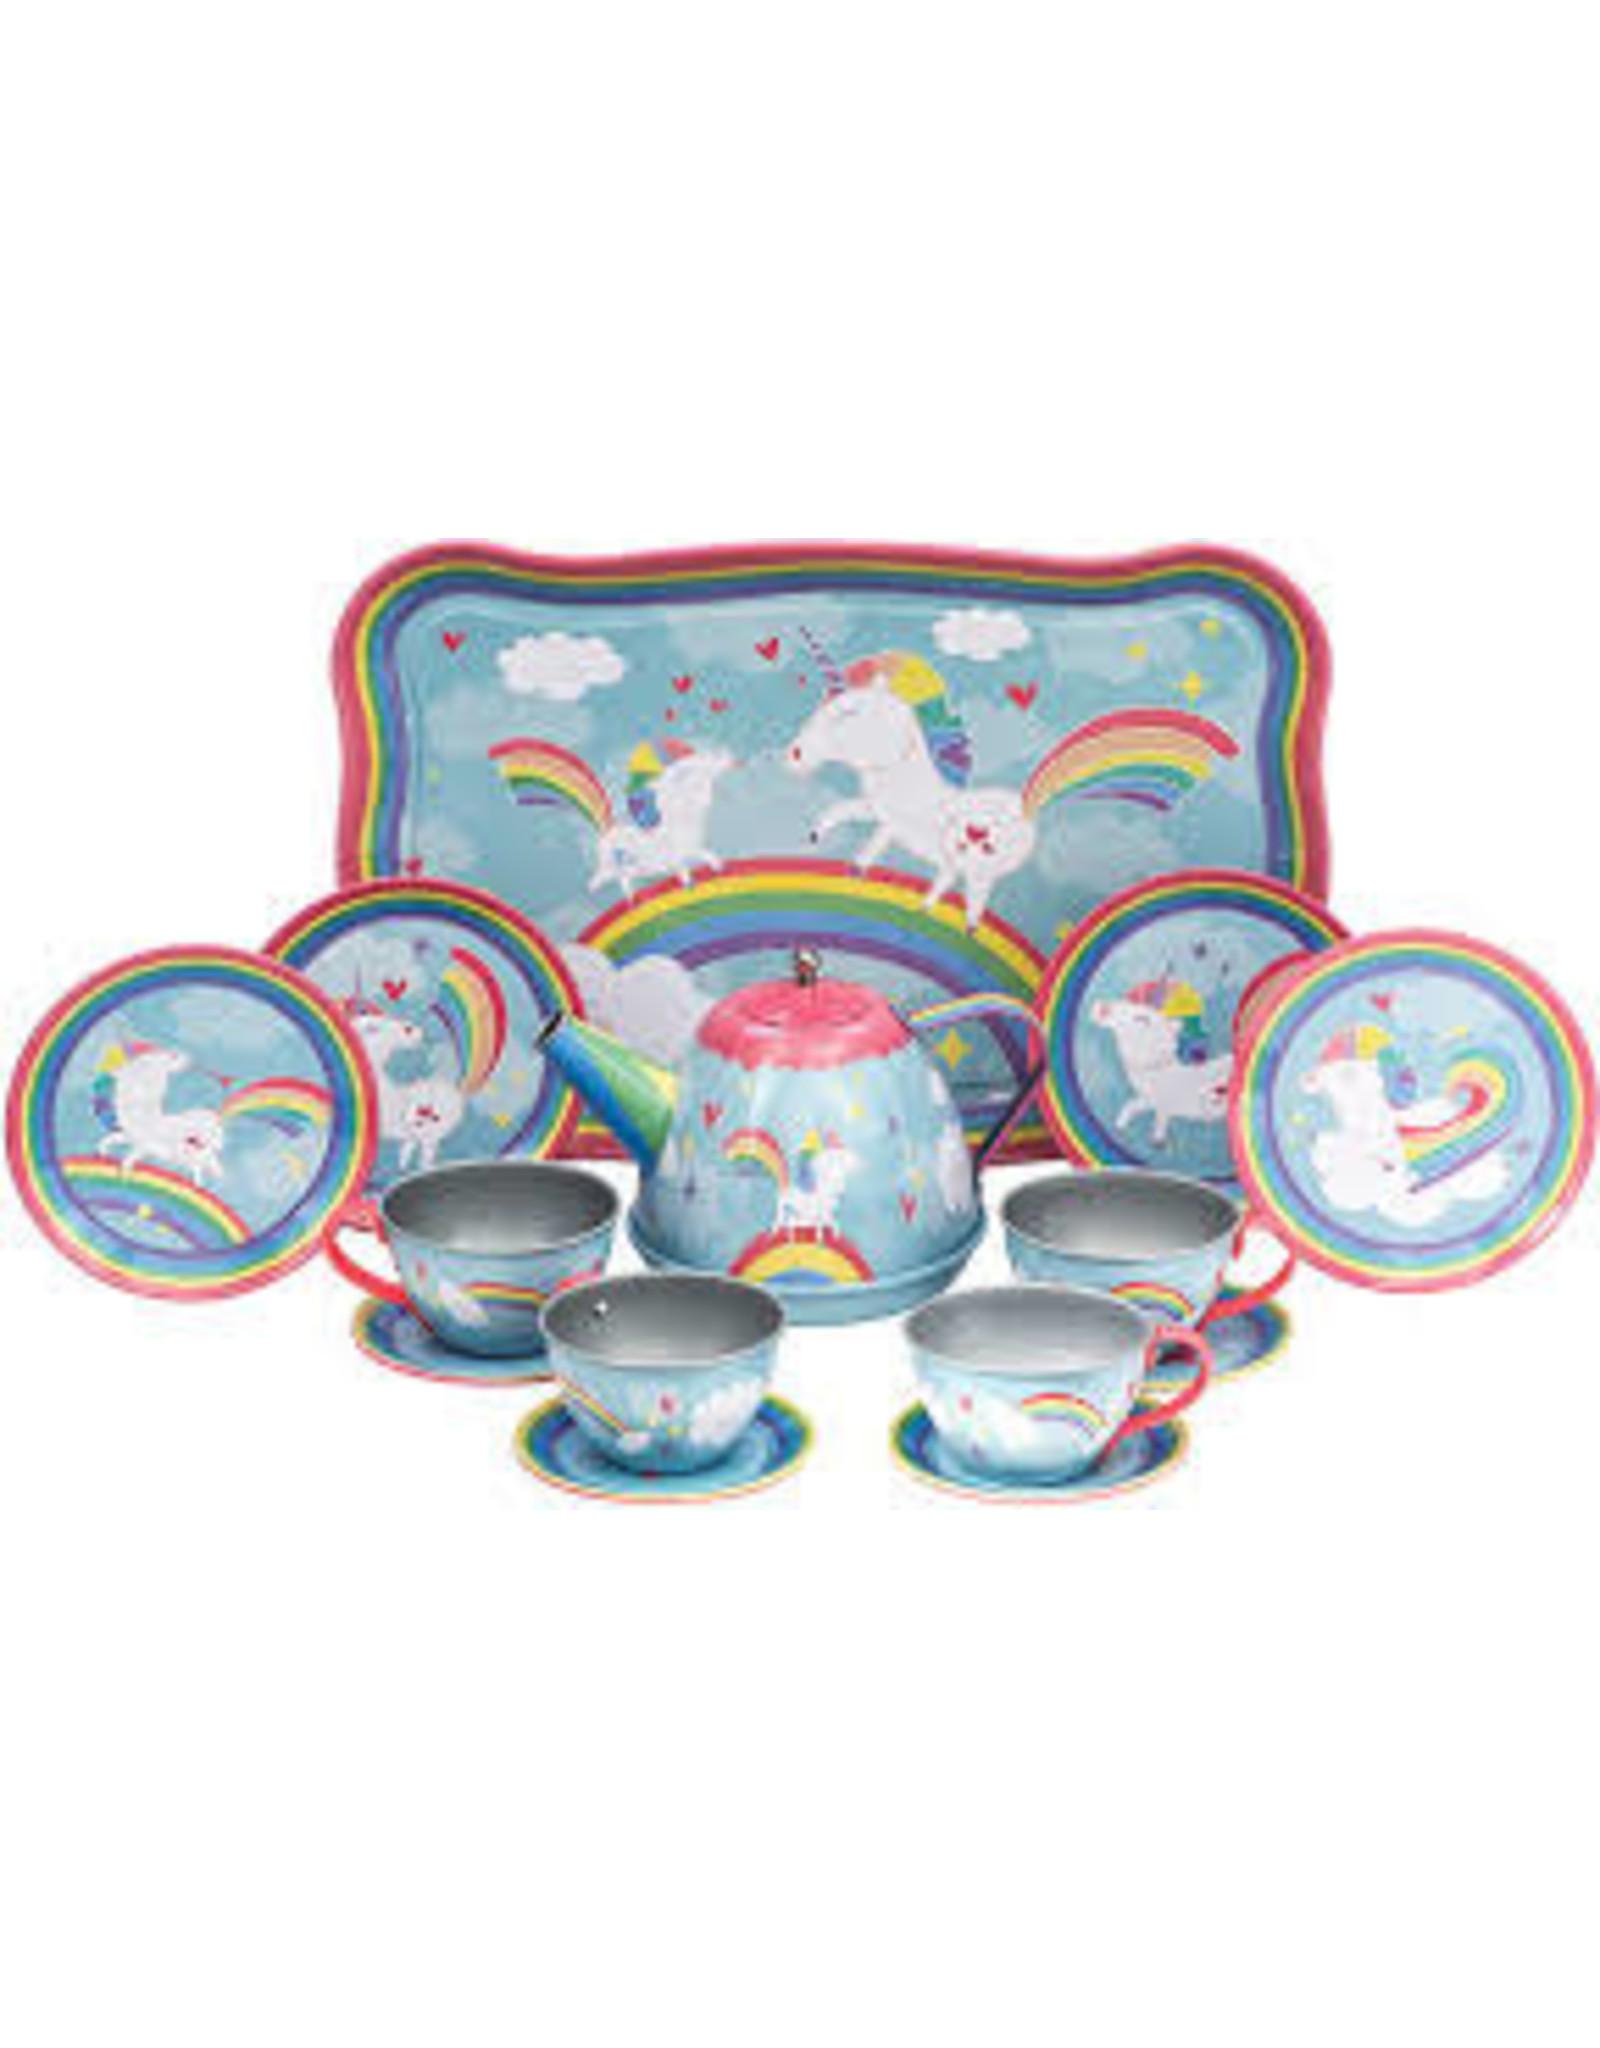 schylling Unicorn Tin Tea Set utts schylling